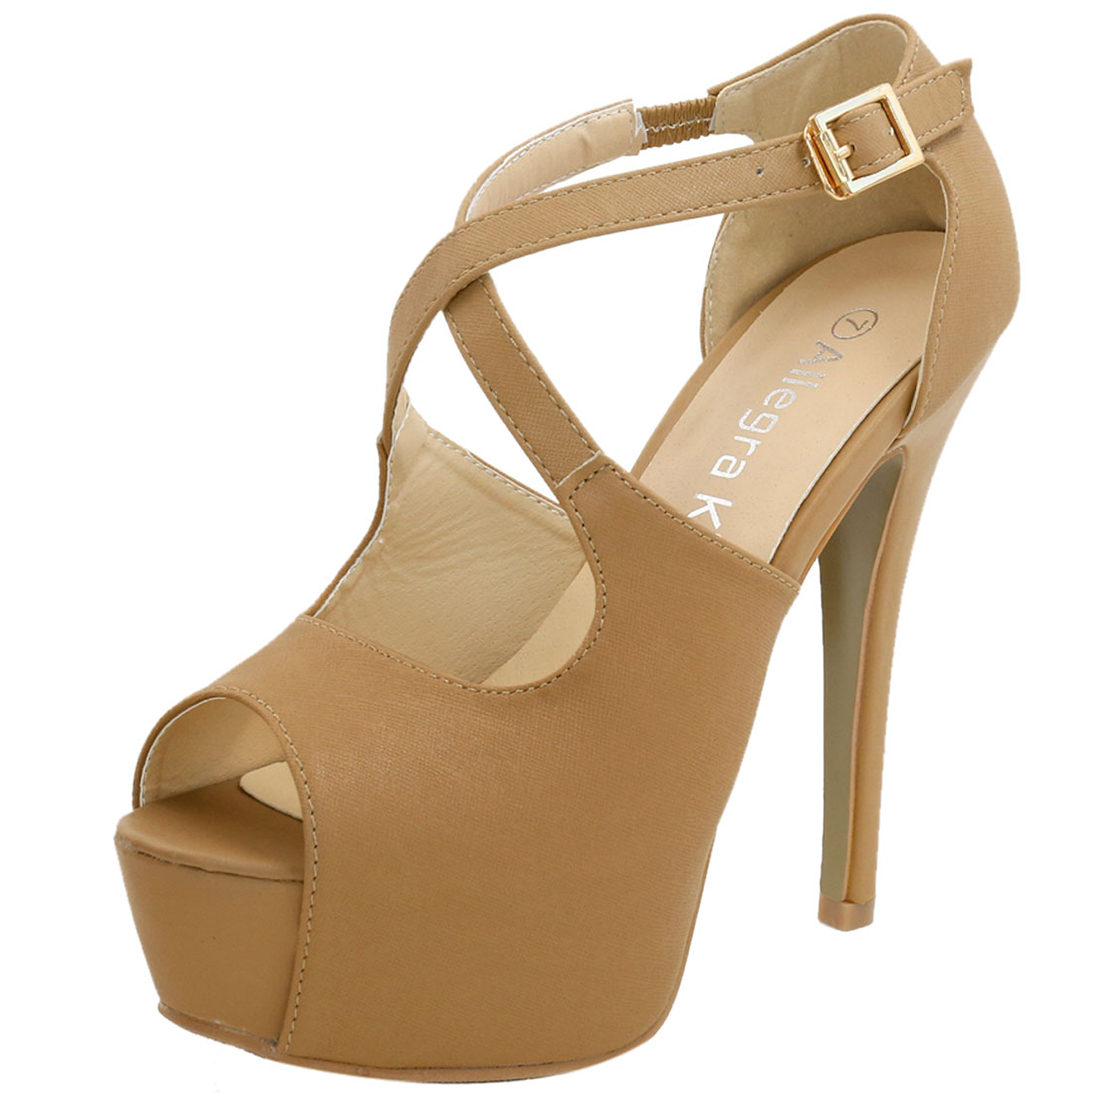 Woman Peep Toe High Heel Crisscross Straps Platform Sandals Tan US 8